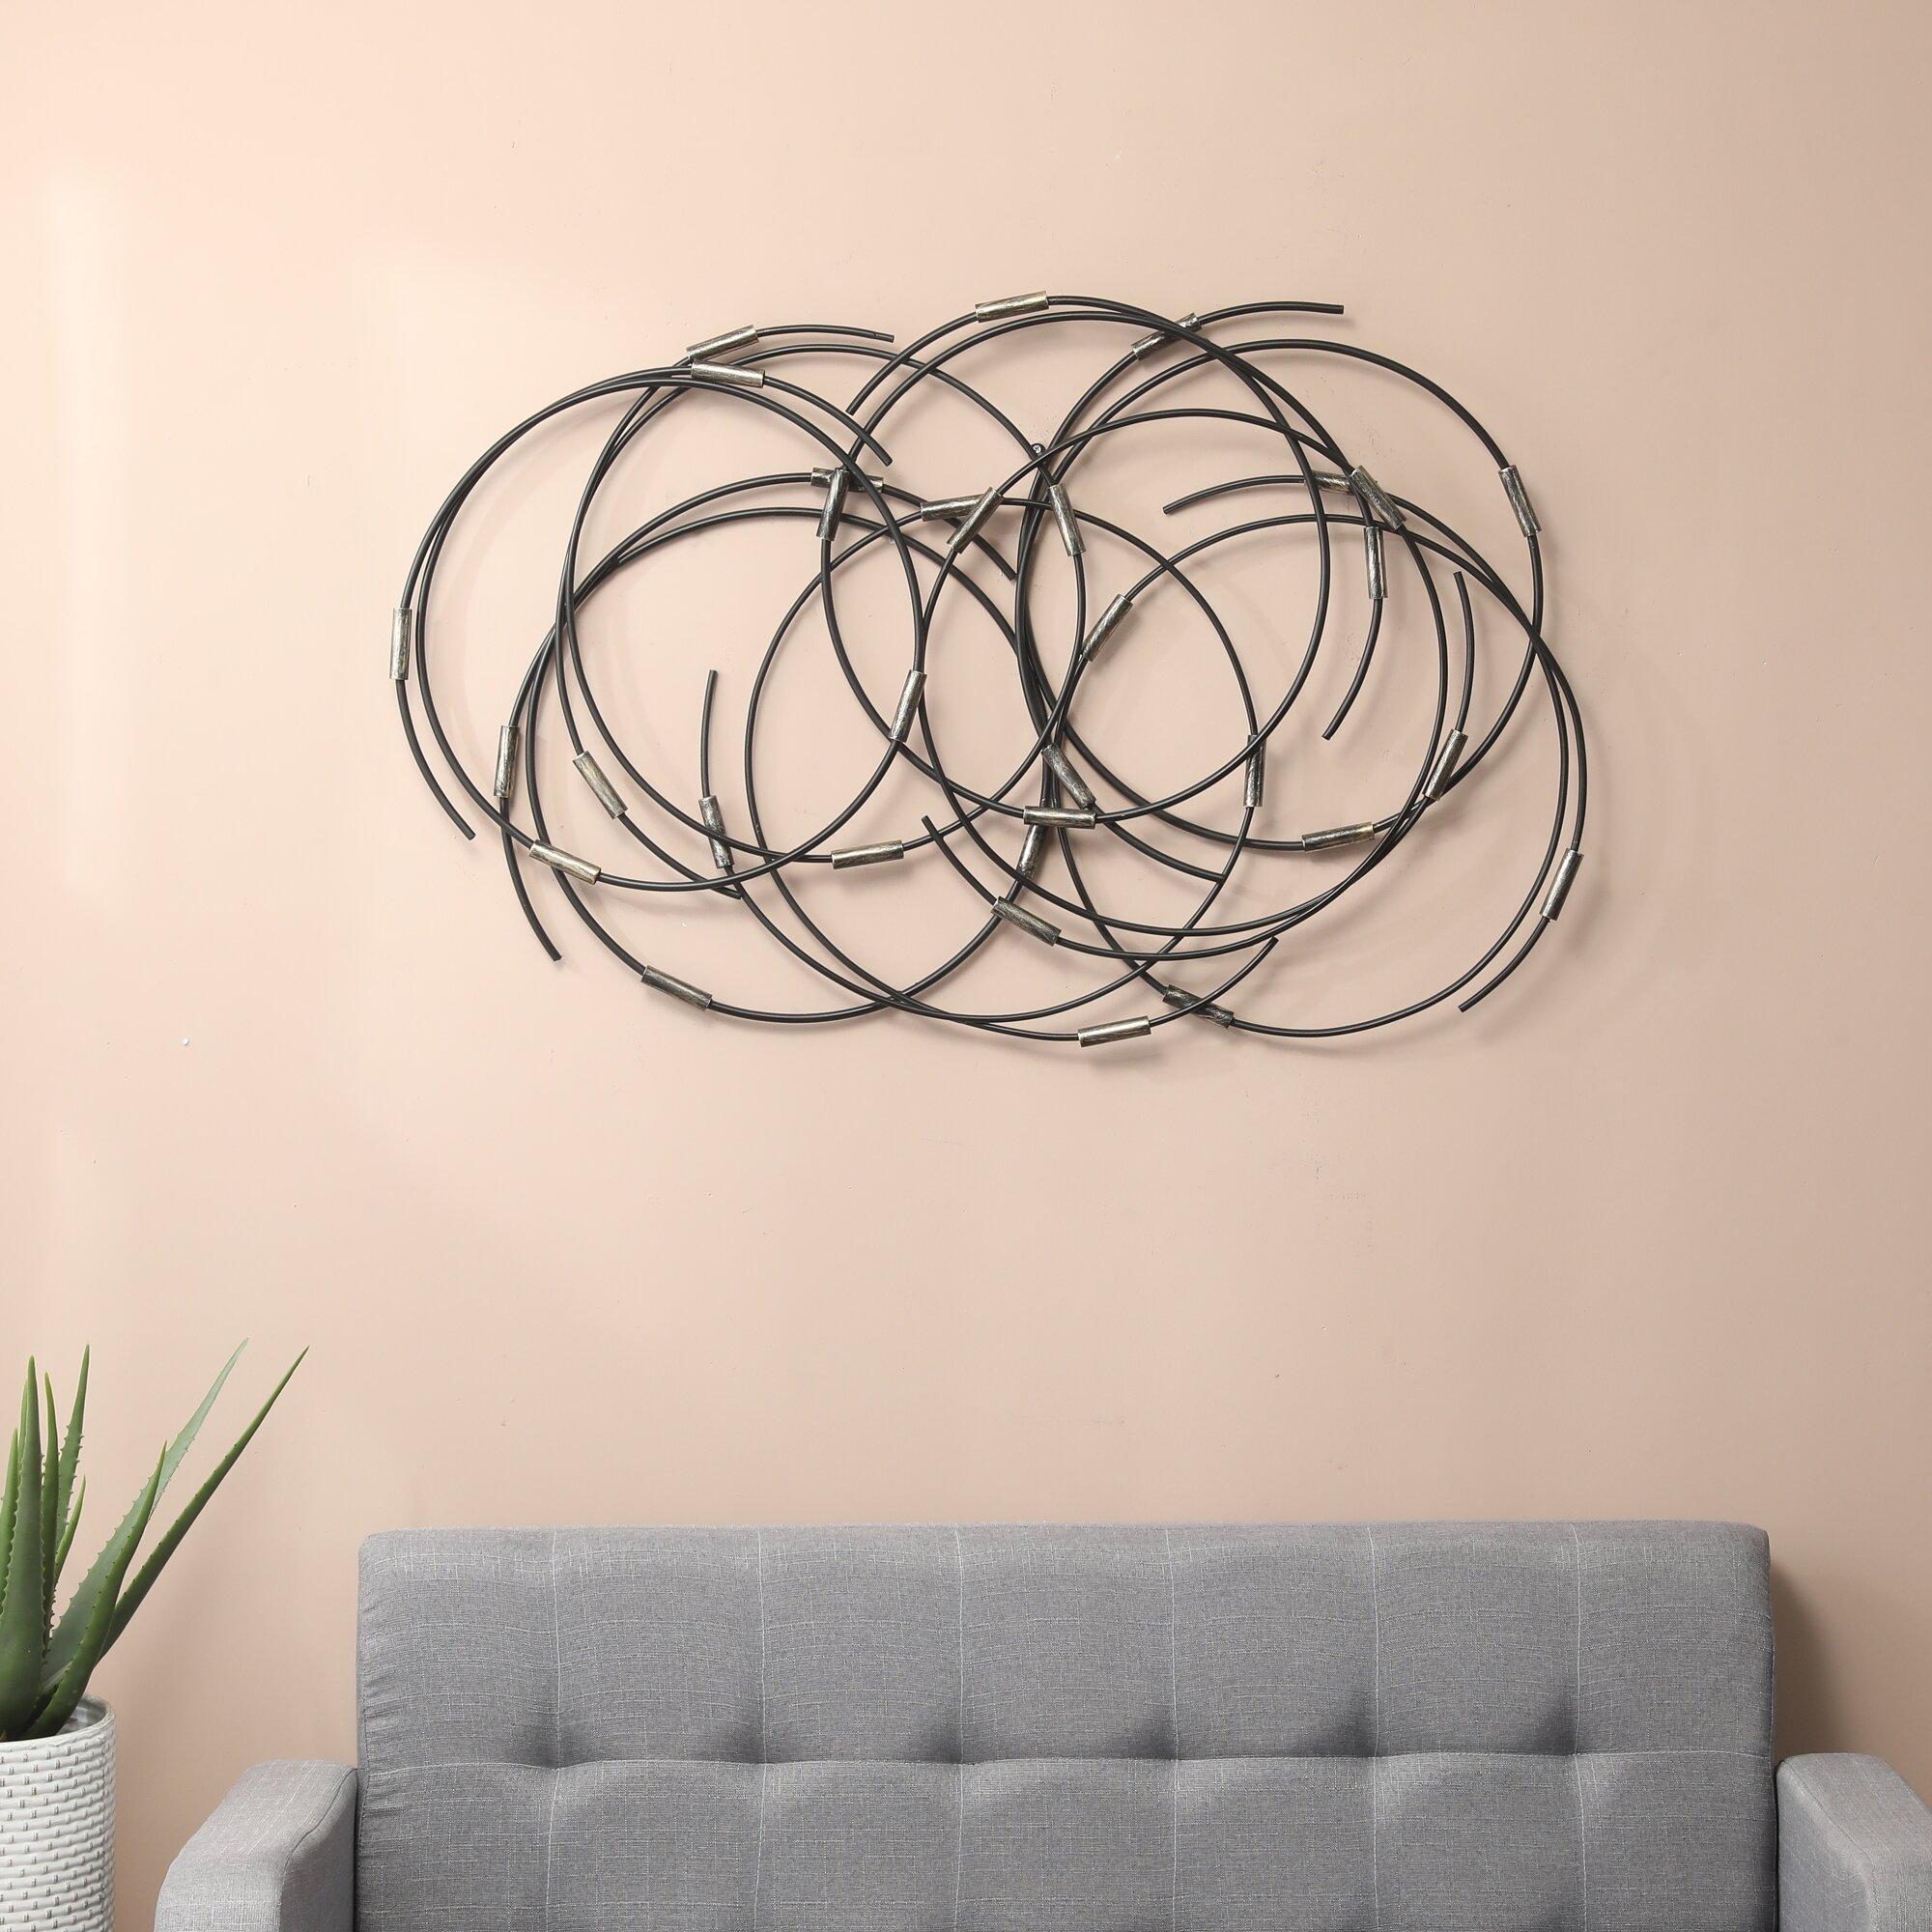 Orren Ellis Metal Circular Wall Décor